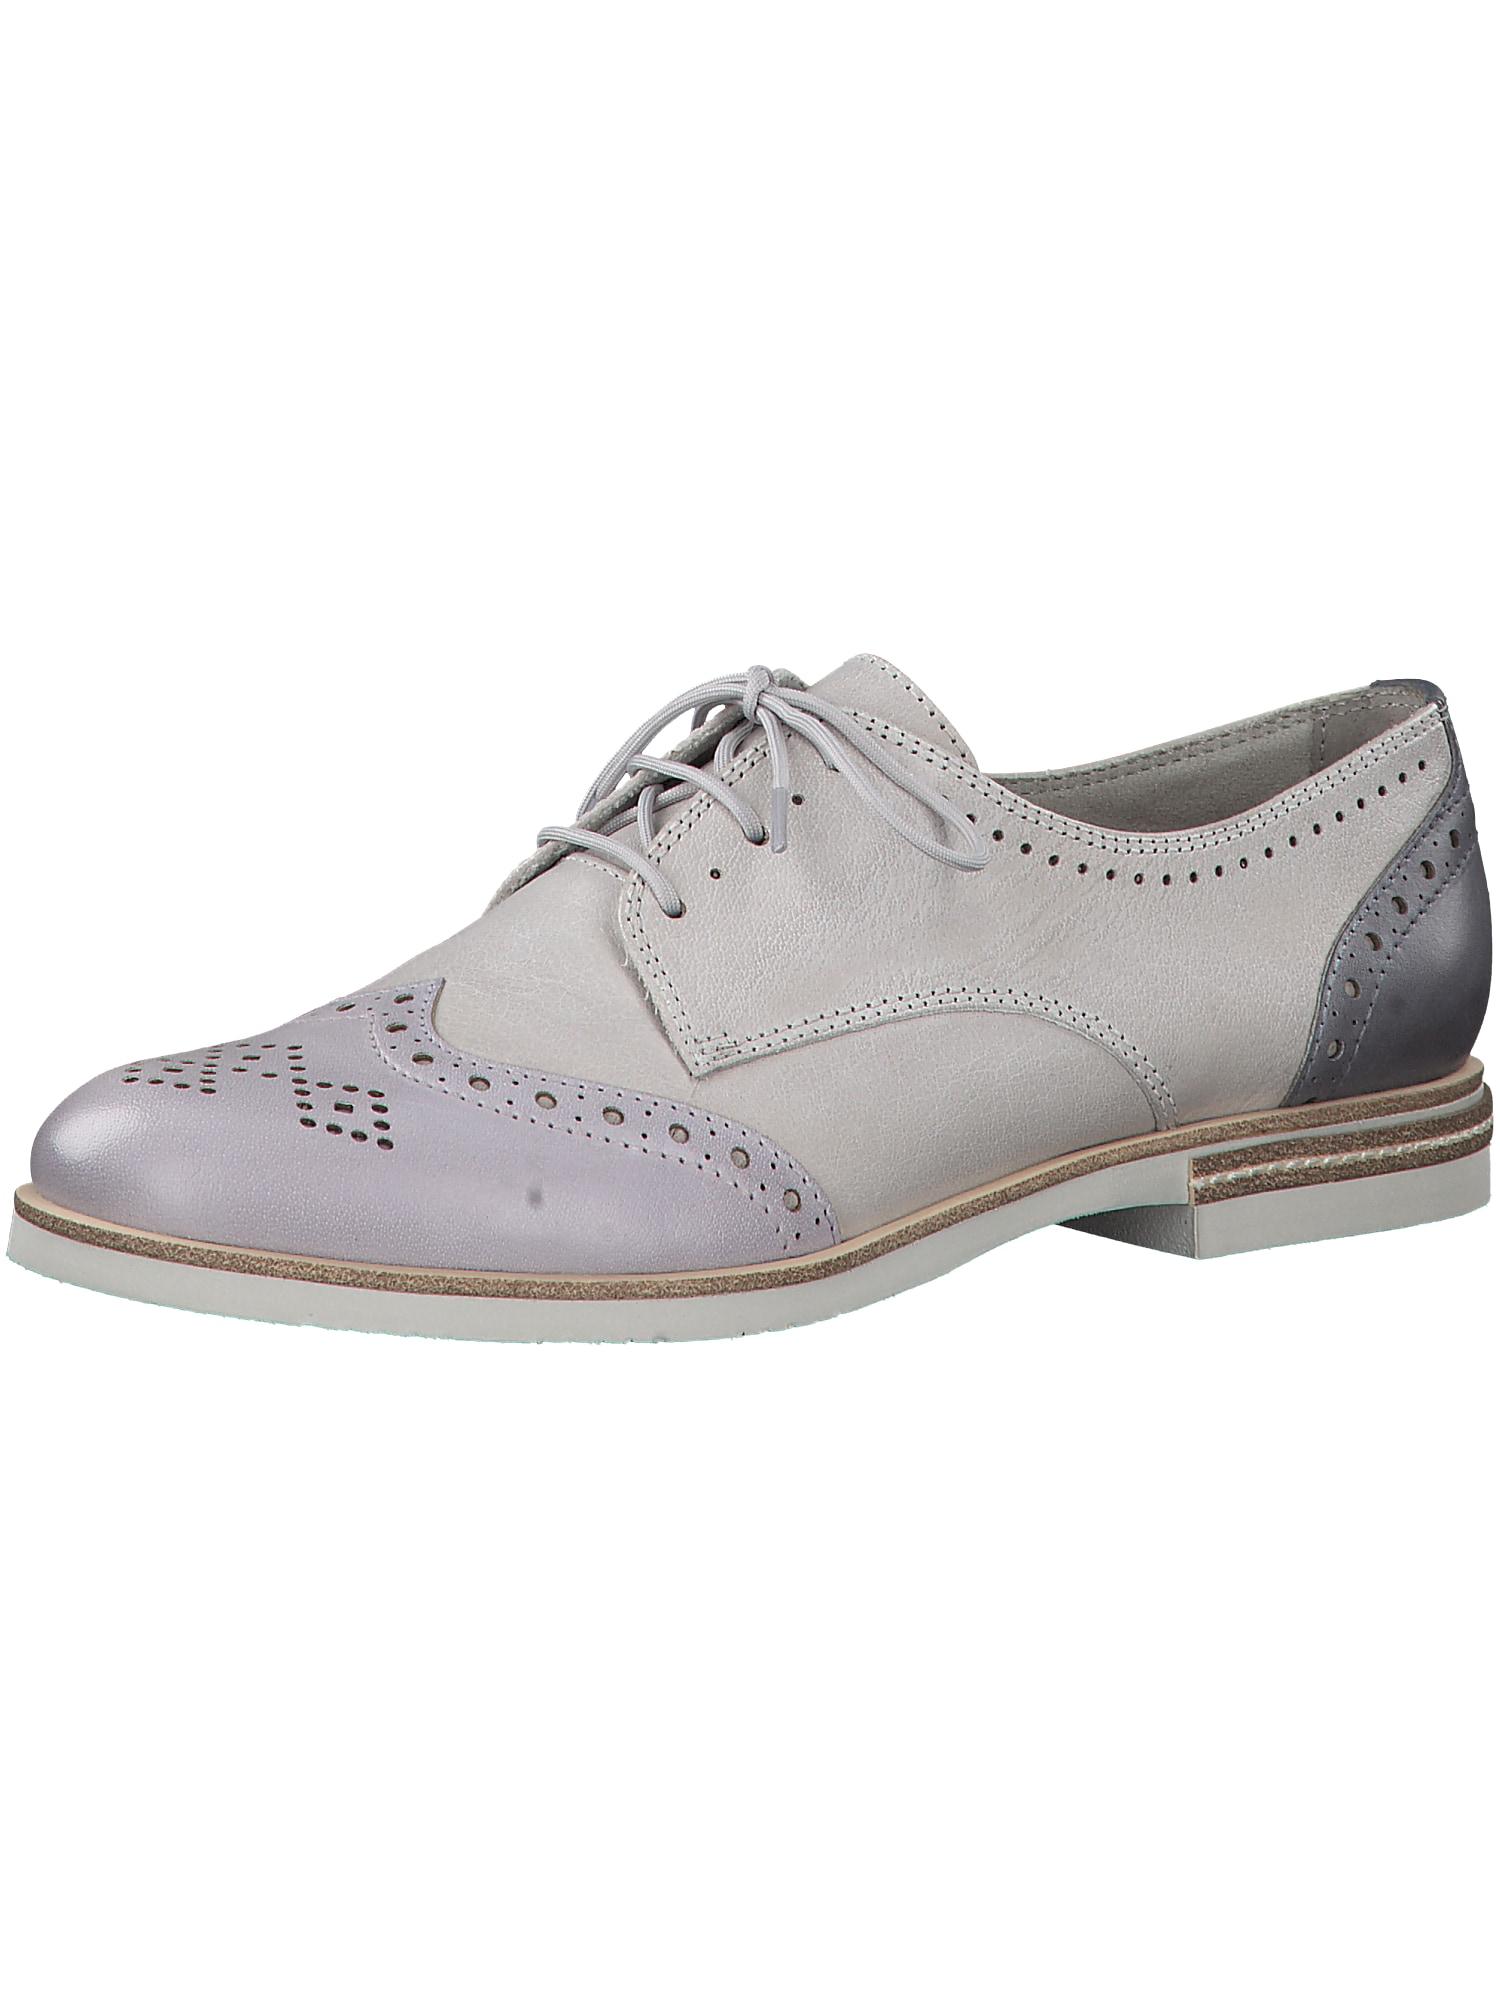 Schnürschuh | Schuhe > Schnürschuhe | Grau - Dunkelgrau - Flieder | tamaris